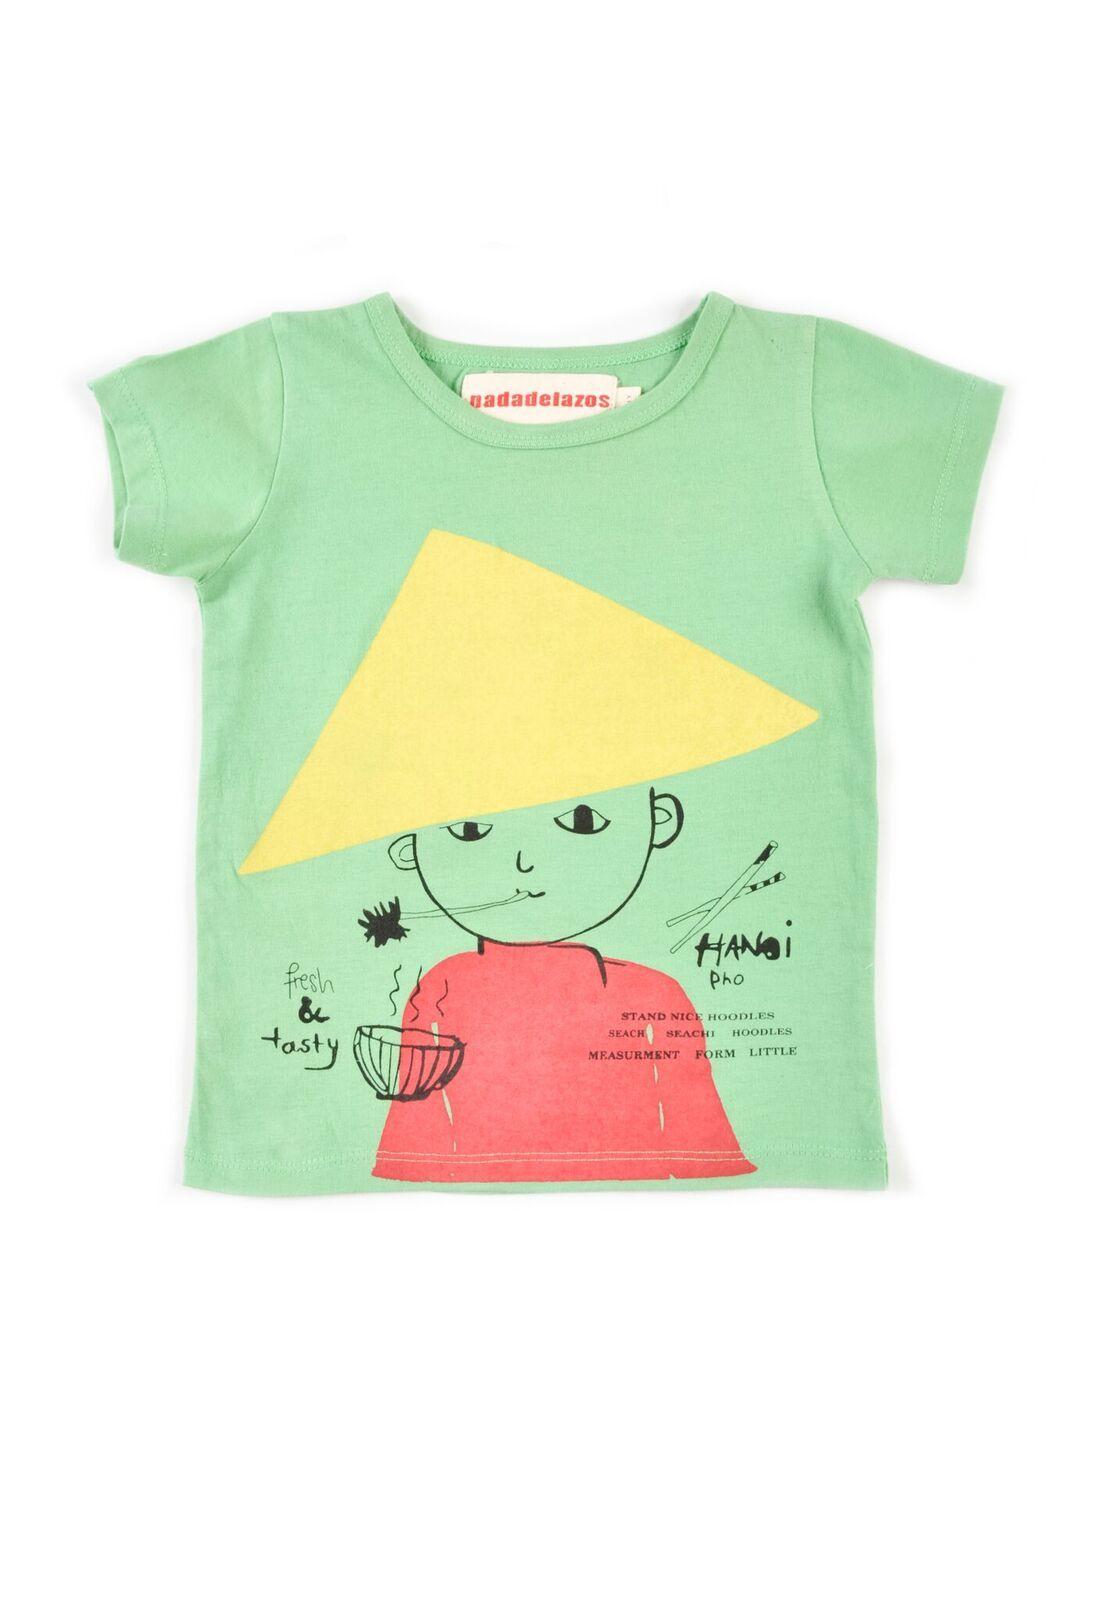 82a405f2a3f6 Οργανική κοντομάνικη μπλούζα - HUΕ 100% οργανικό βαμβάκι jersey nadadelazos παιδικα  ρουχα